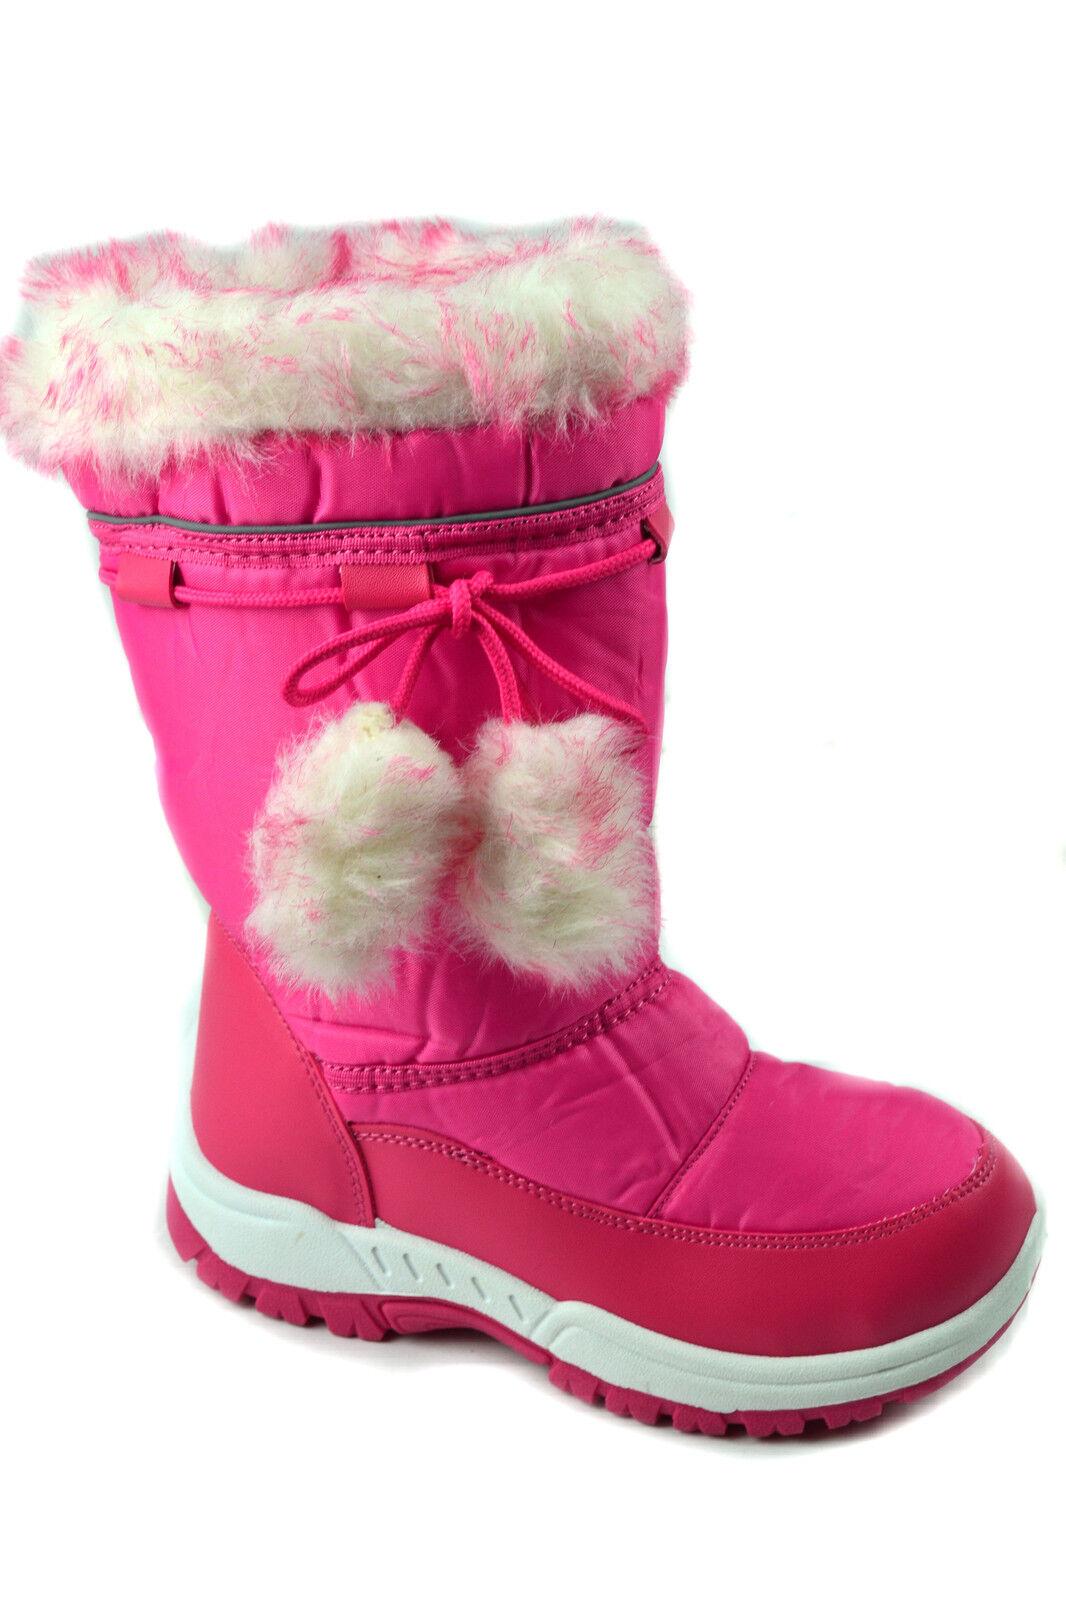 GIRLS WINTER KIDS FUR SNOW BOYS MUCKER WATERPROOF WELLINGTON WELLIES BOOTS SHOES